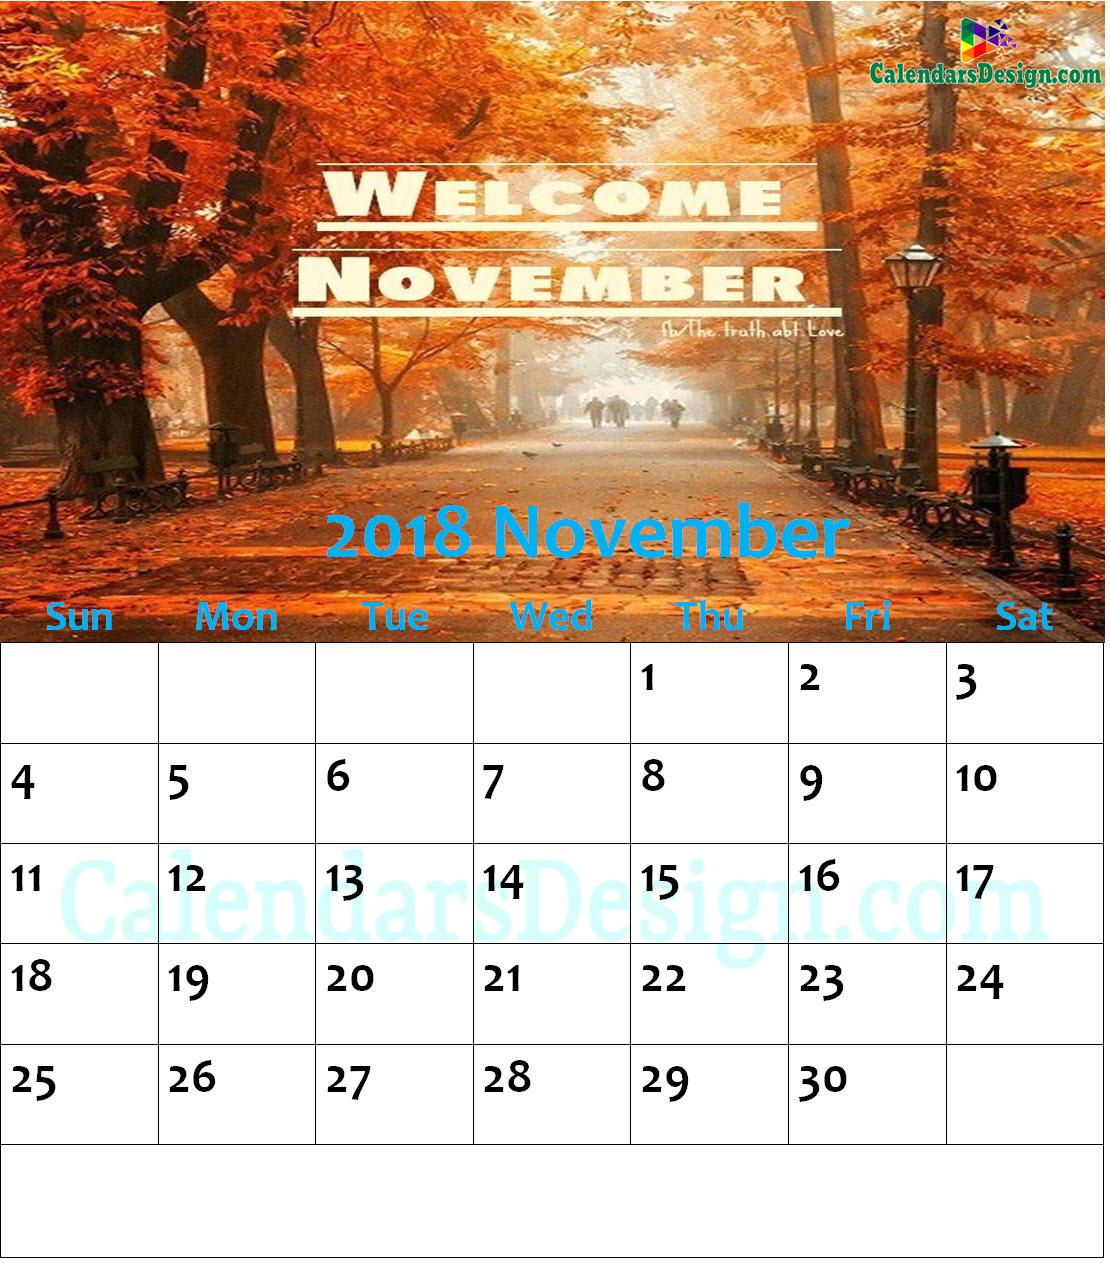 November 2018 Wall Calendar